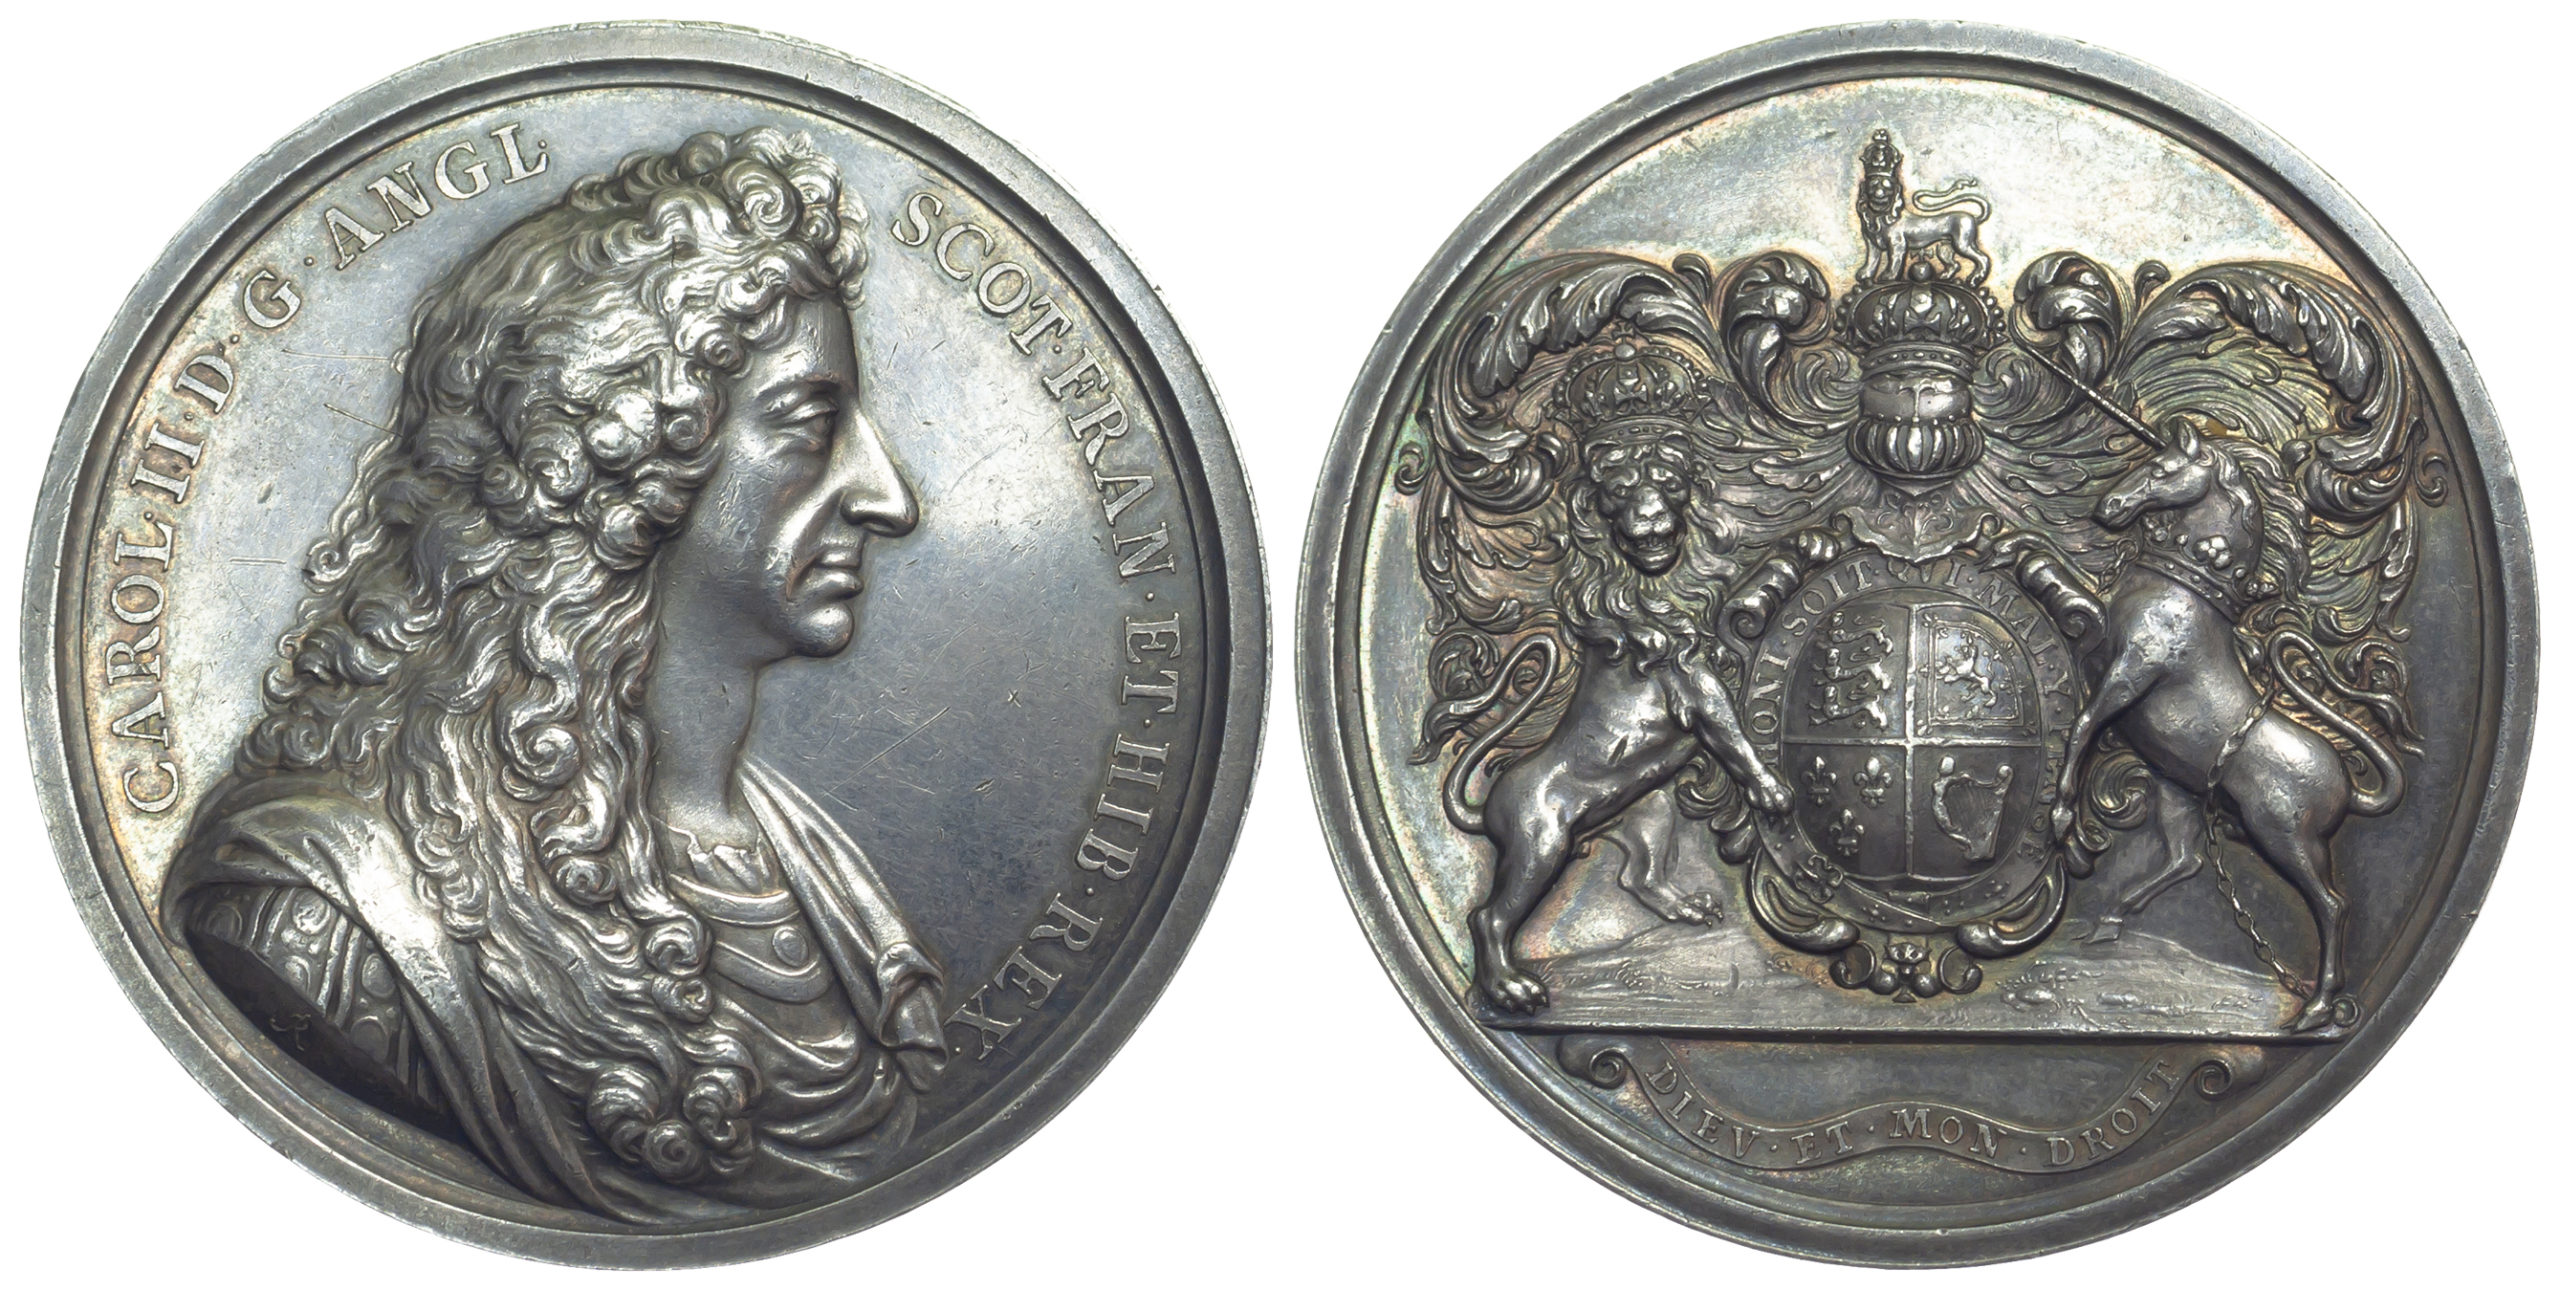 Charles II, Silver Presentation Medal, c.1683